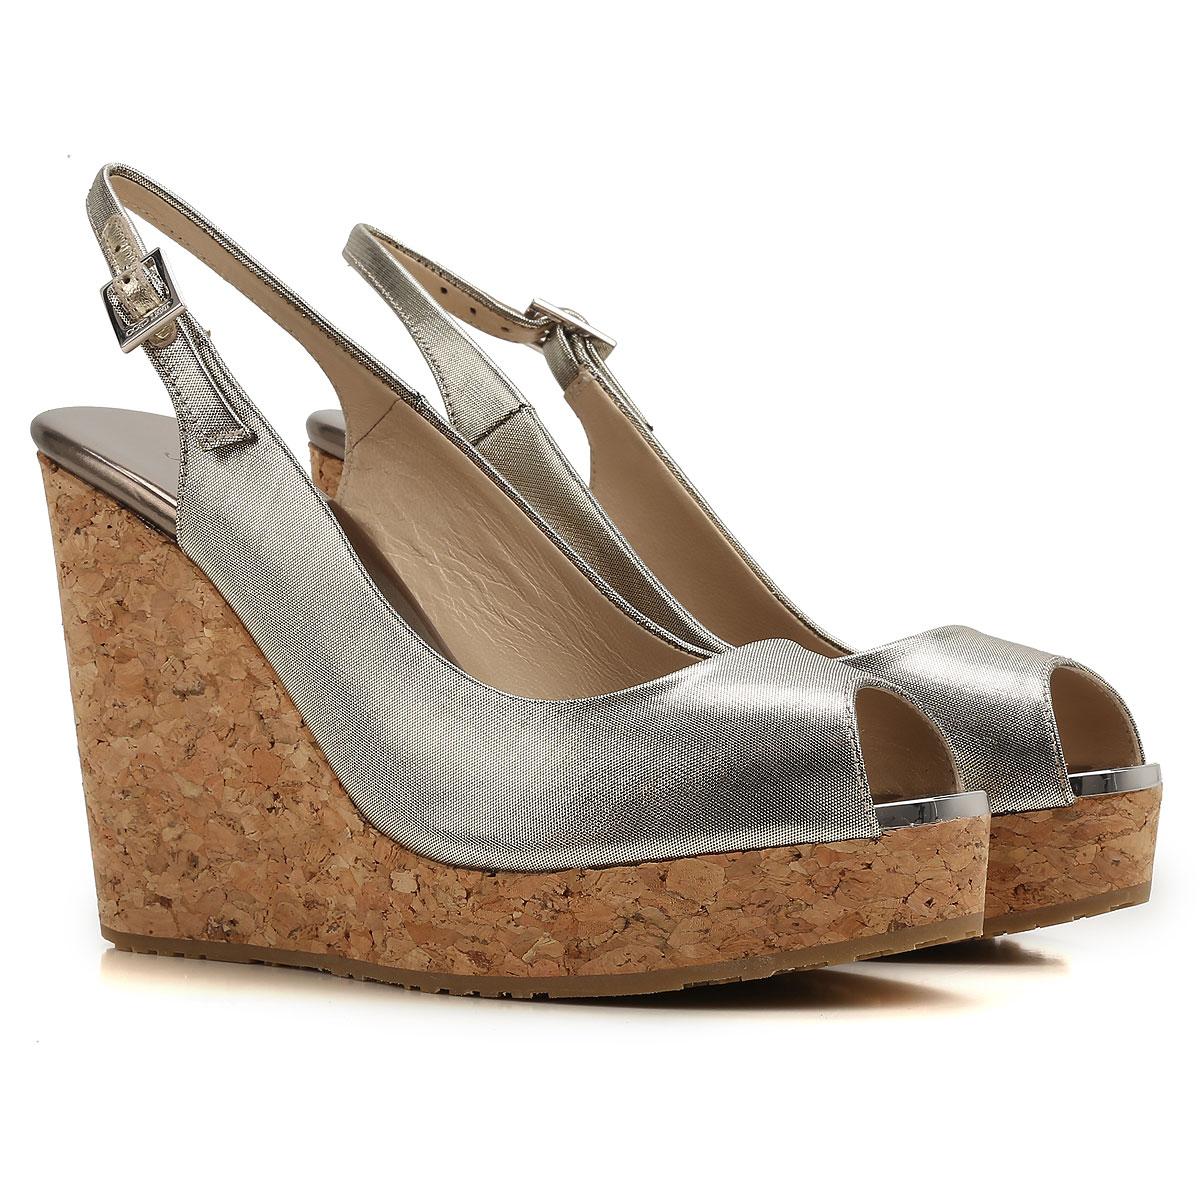 chaussures femme jimmy choo code produit prova oro. Black Bedroom Furniture Sets. Home Design Ideas